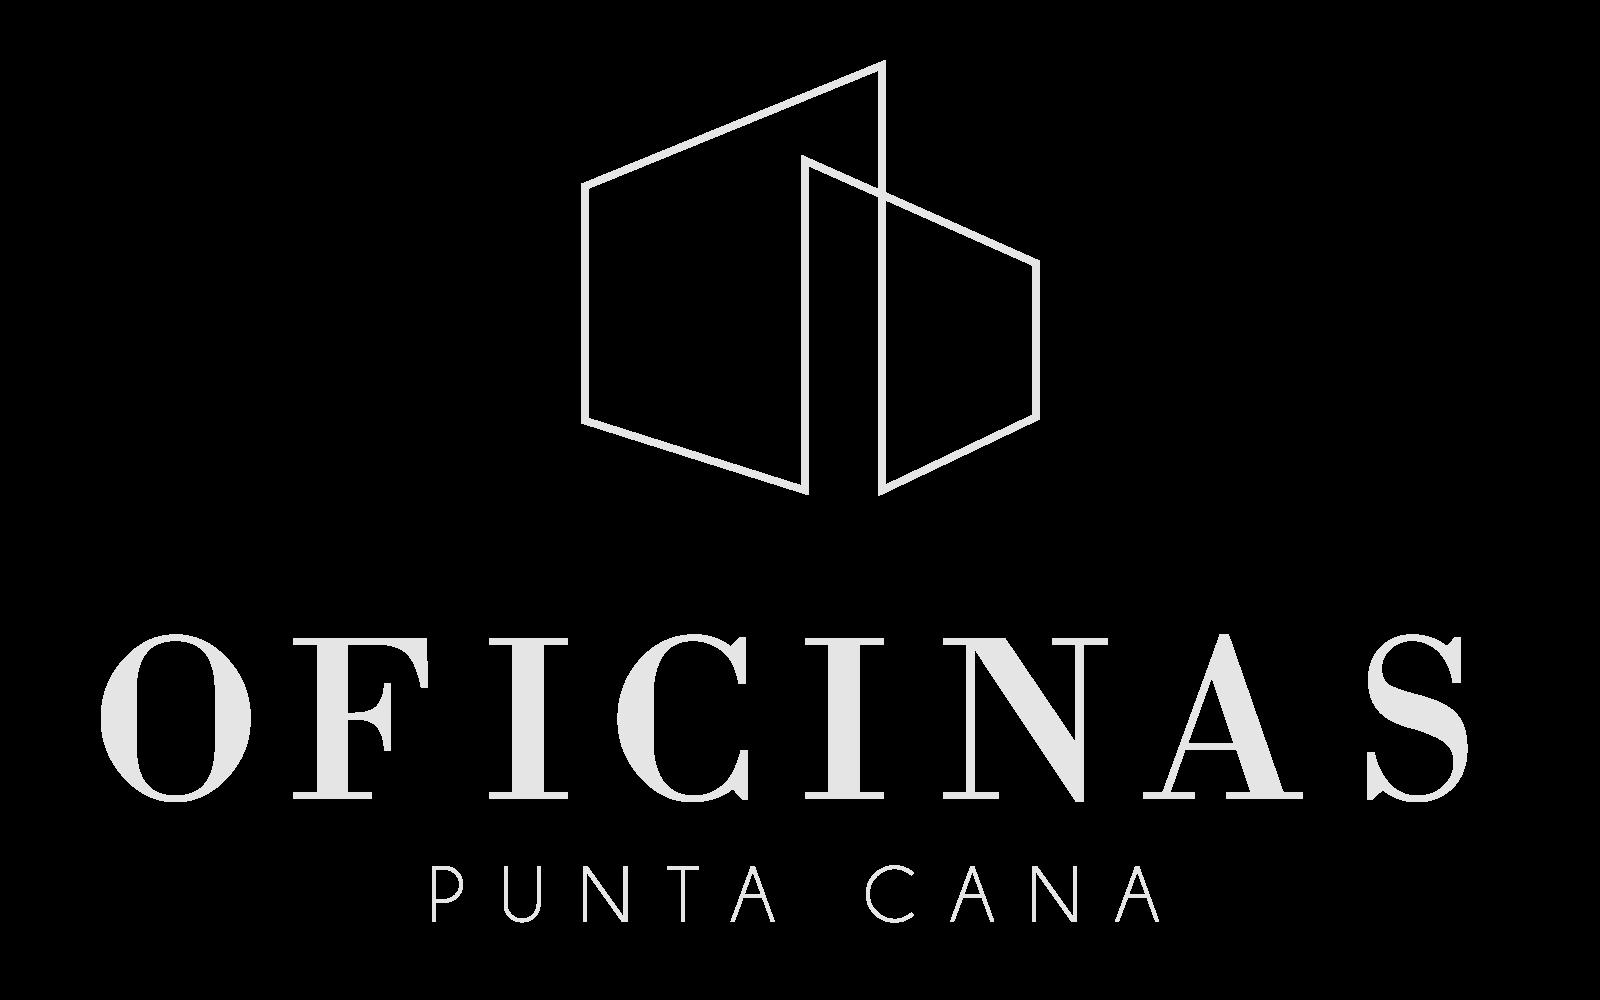 Oficinas Punta Cana